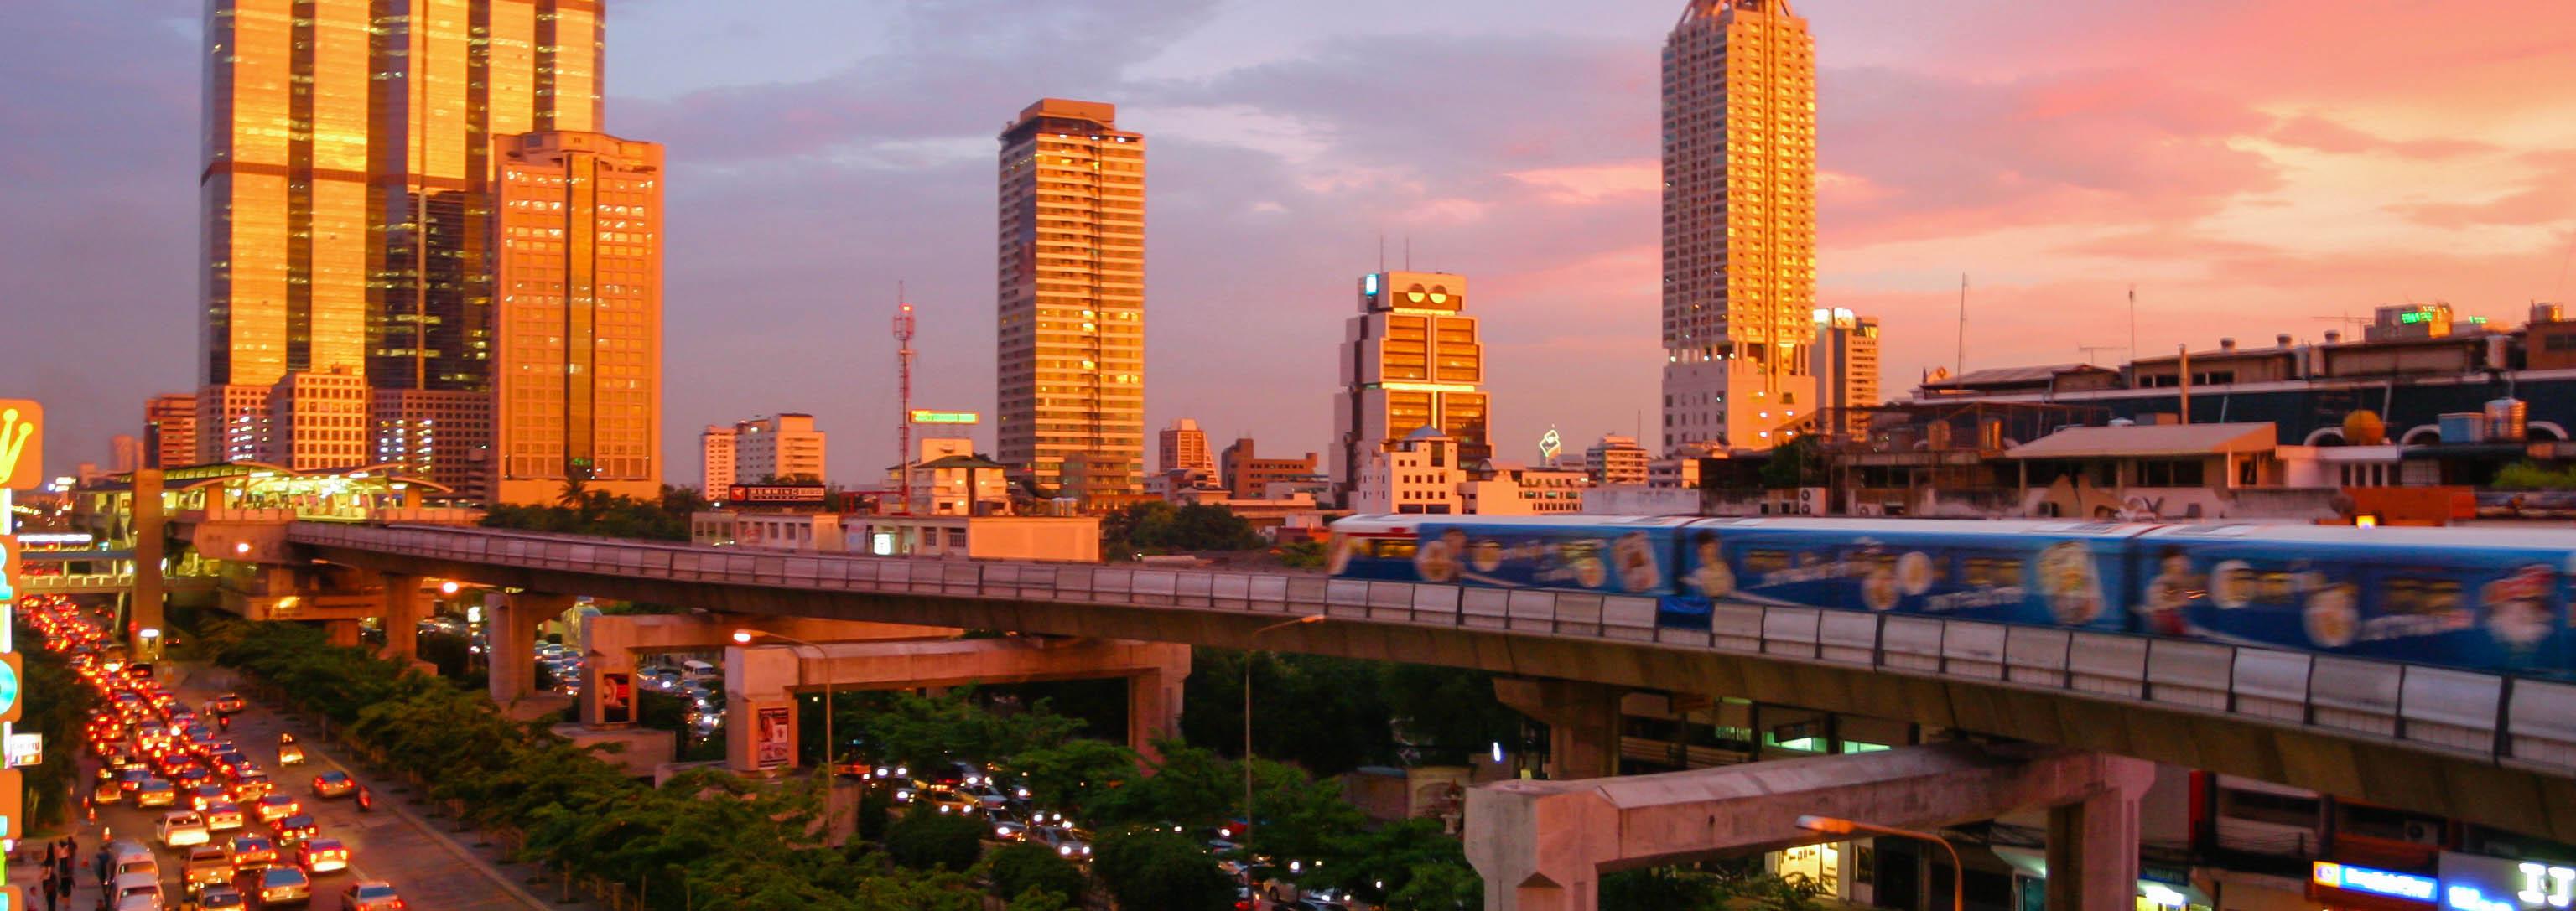 Bangkok_skytrain_sunset3